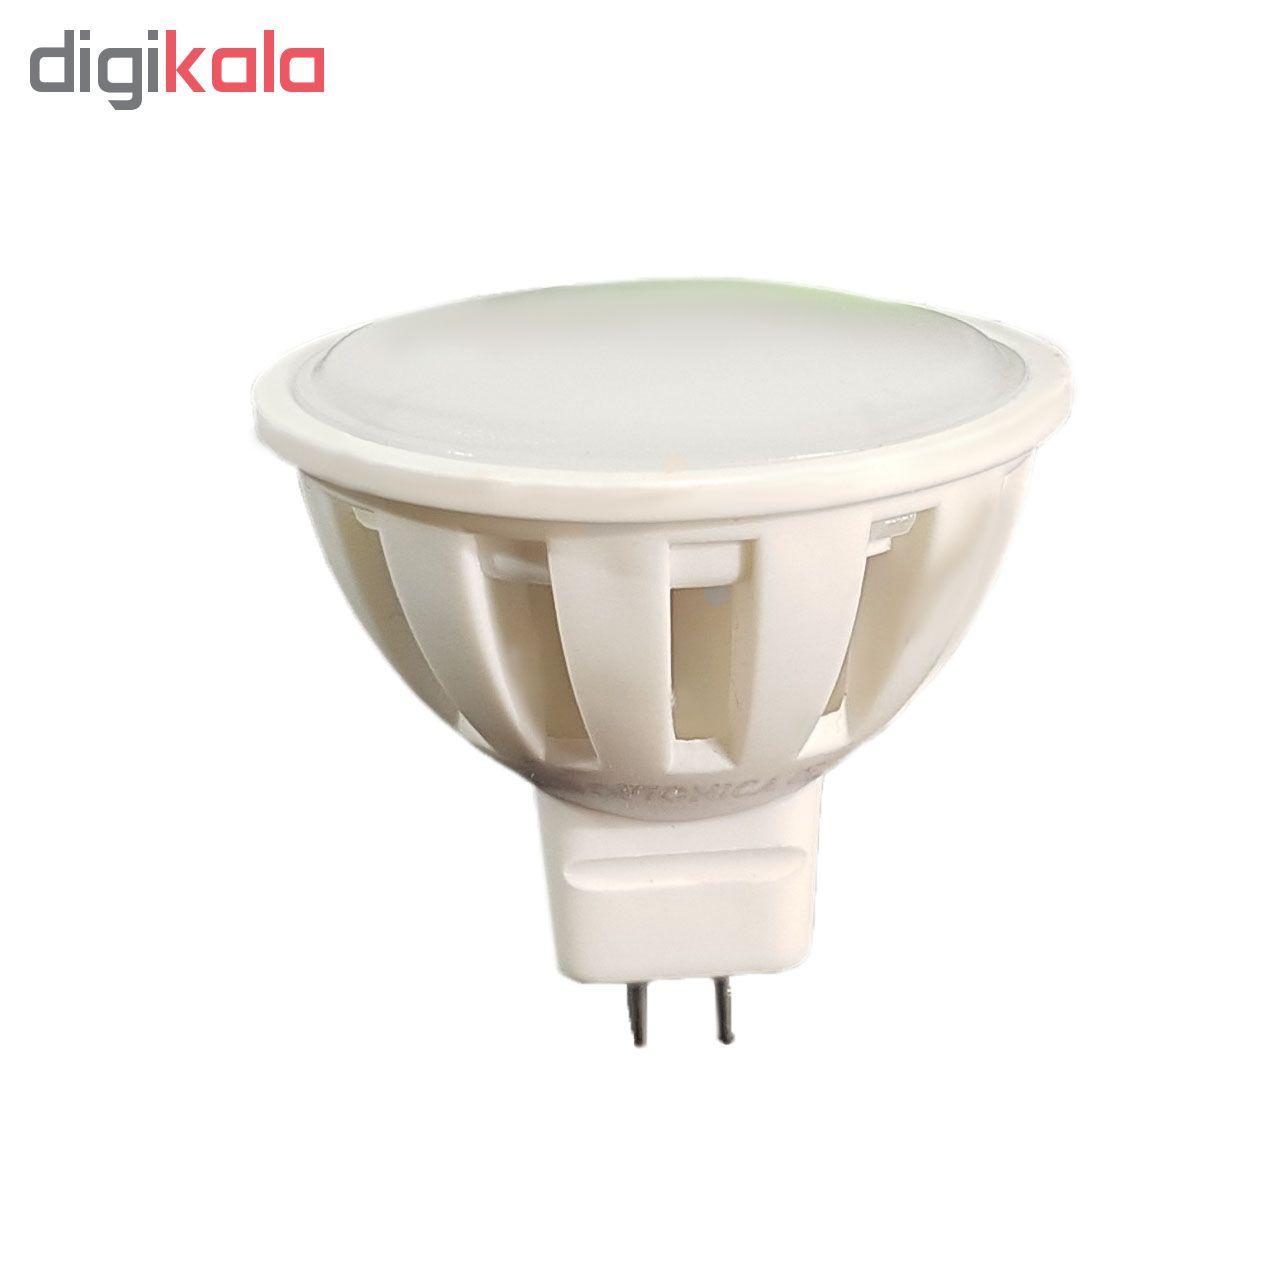 لامپ ال ای دی 5 وات ZZ کد هالوژن پایه GU5.3  main 1 1